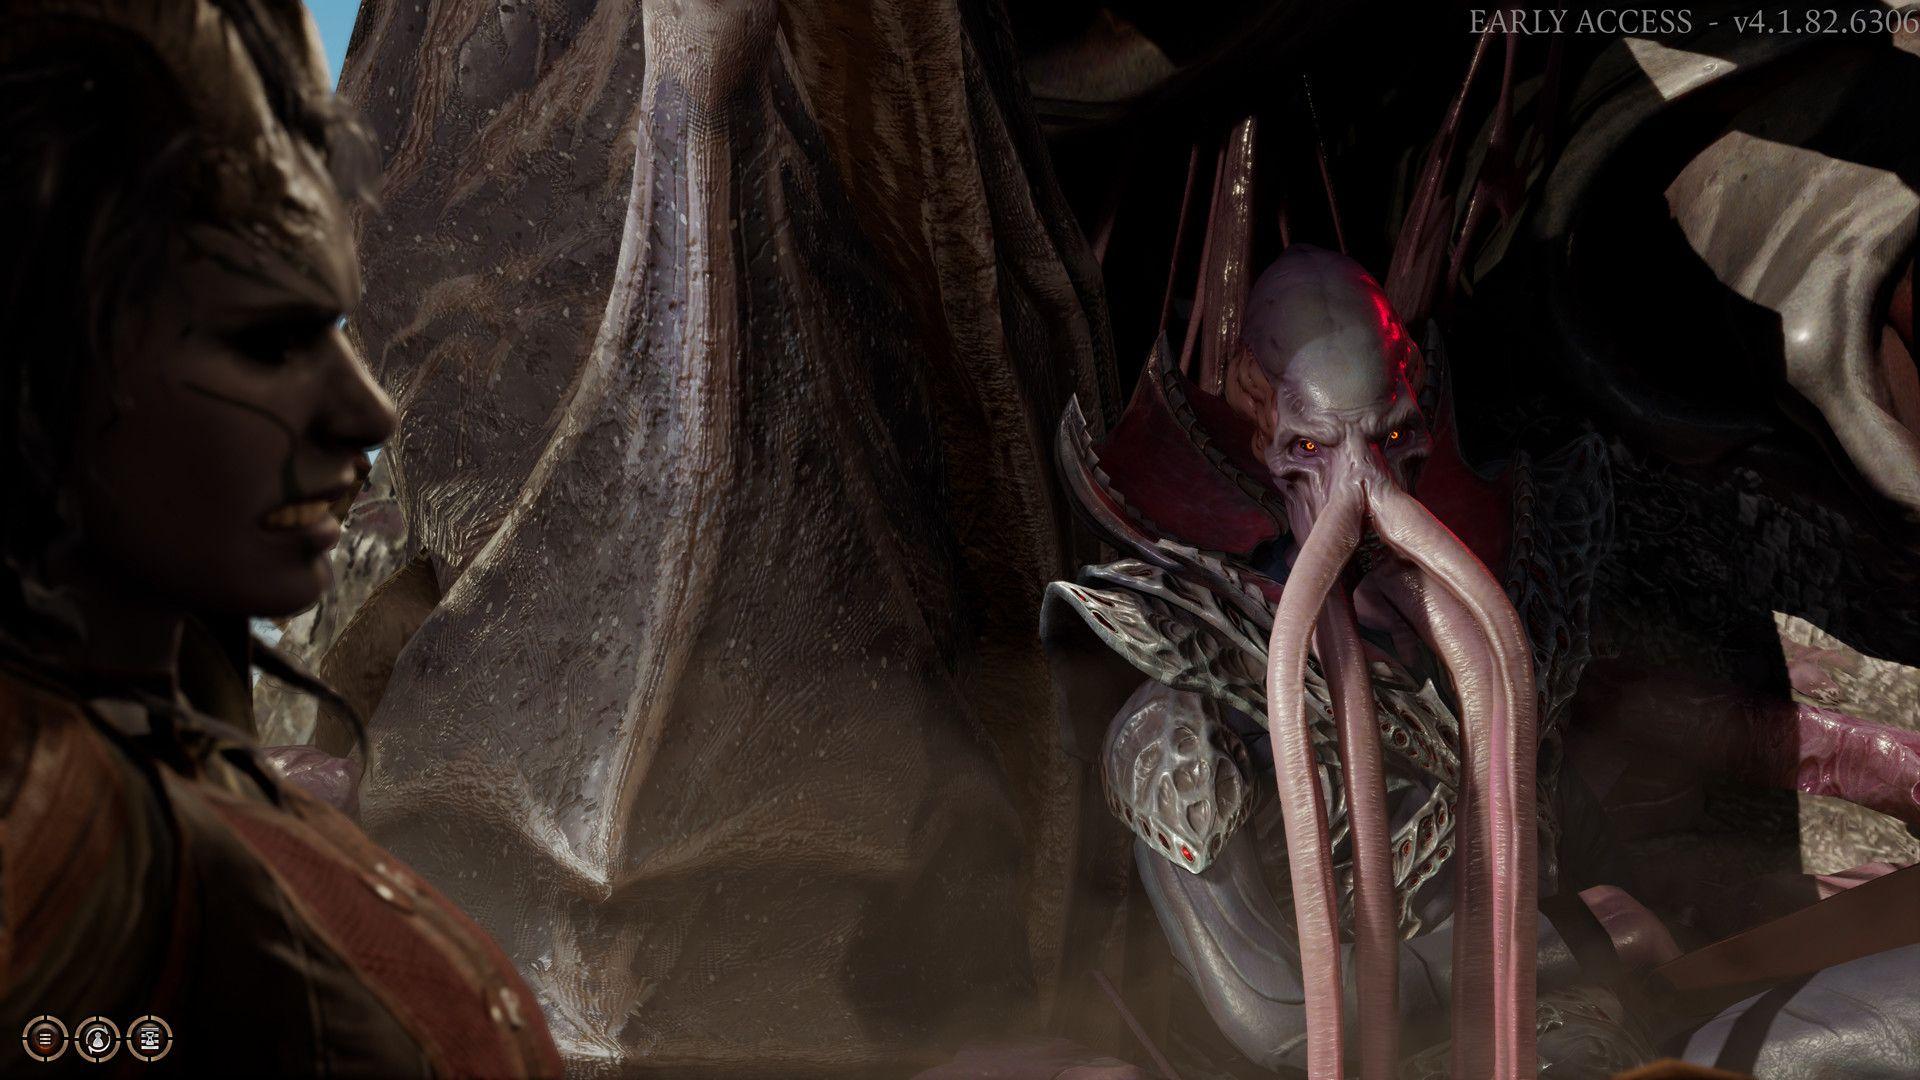 Baldur's Gate 3 May be the Biggest RPG of 2021 – Here's 15 Reasons Why